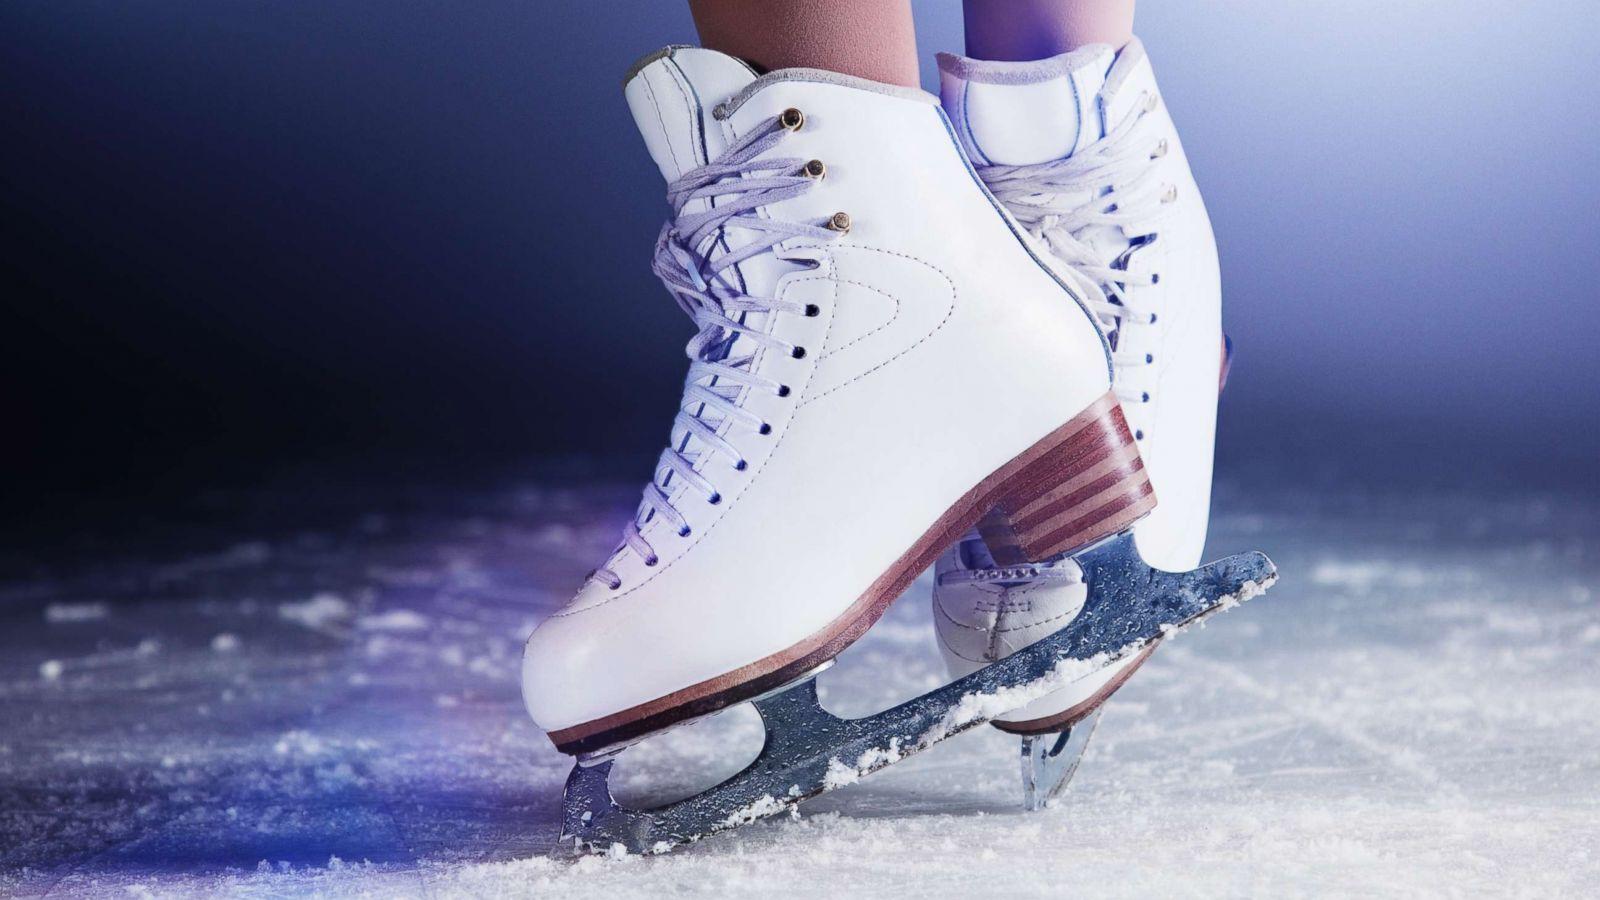 john warner school f4175 yrs 12 and 13 ice skating trip to van